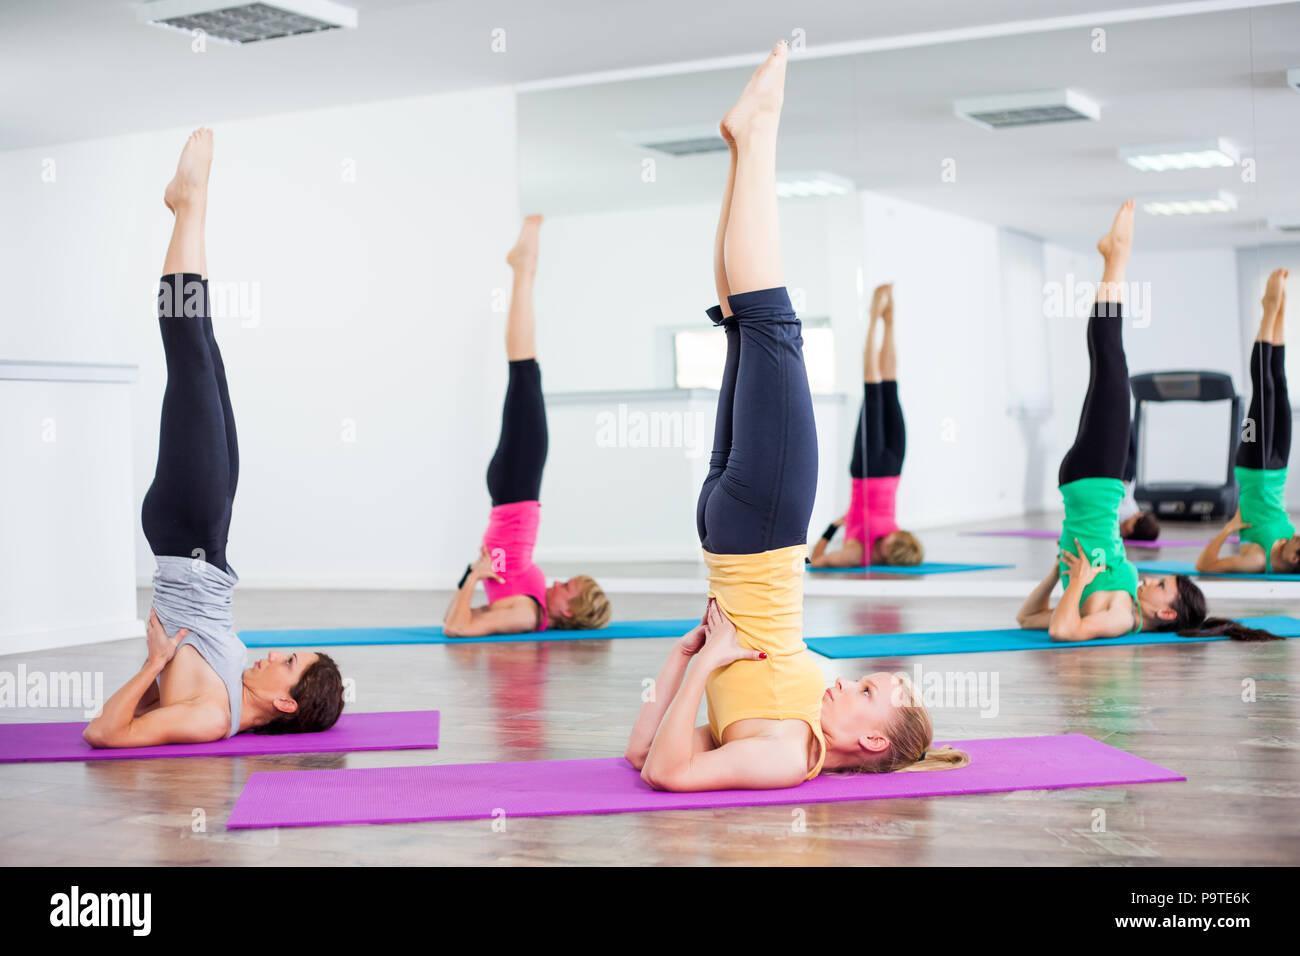 Four girls practicing yoga, Salamba Sarvangasana / Supported shoulder stand - Stock Image